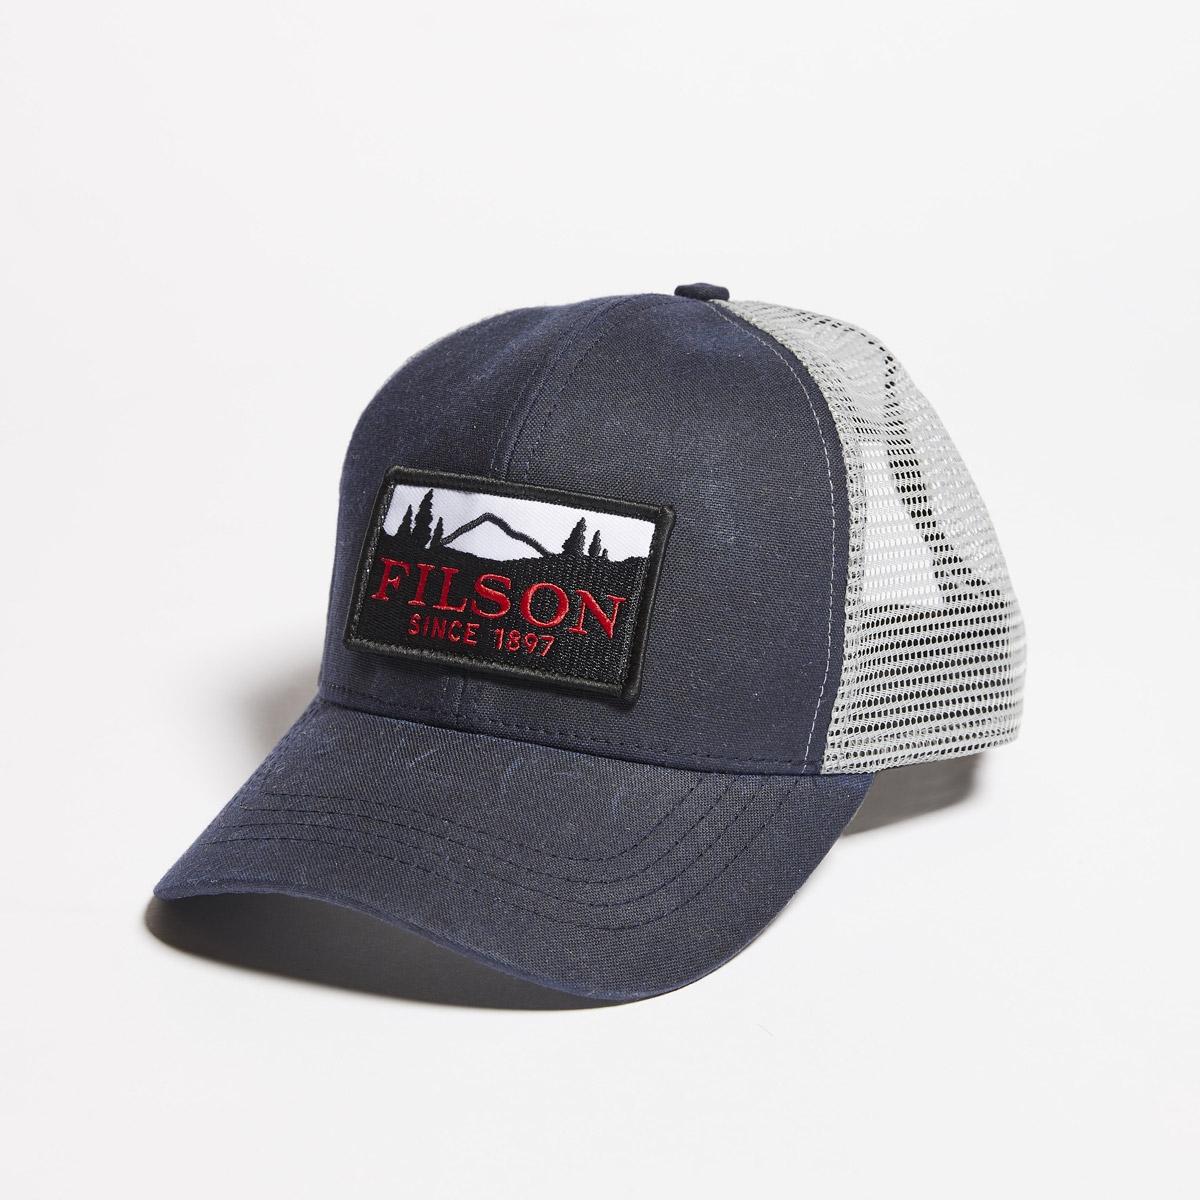 Filson Mesh Logger Cap-Navy, Robustes 6 Panel Logger Cap mit Mesh Panels für optimale Belüftung